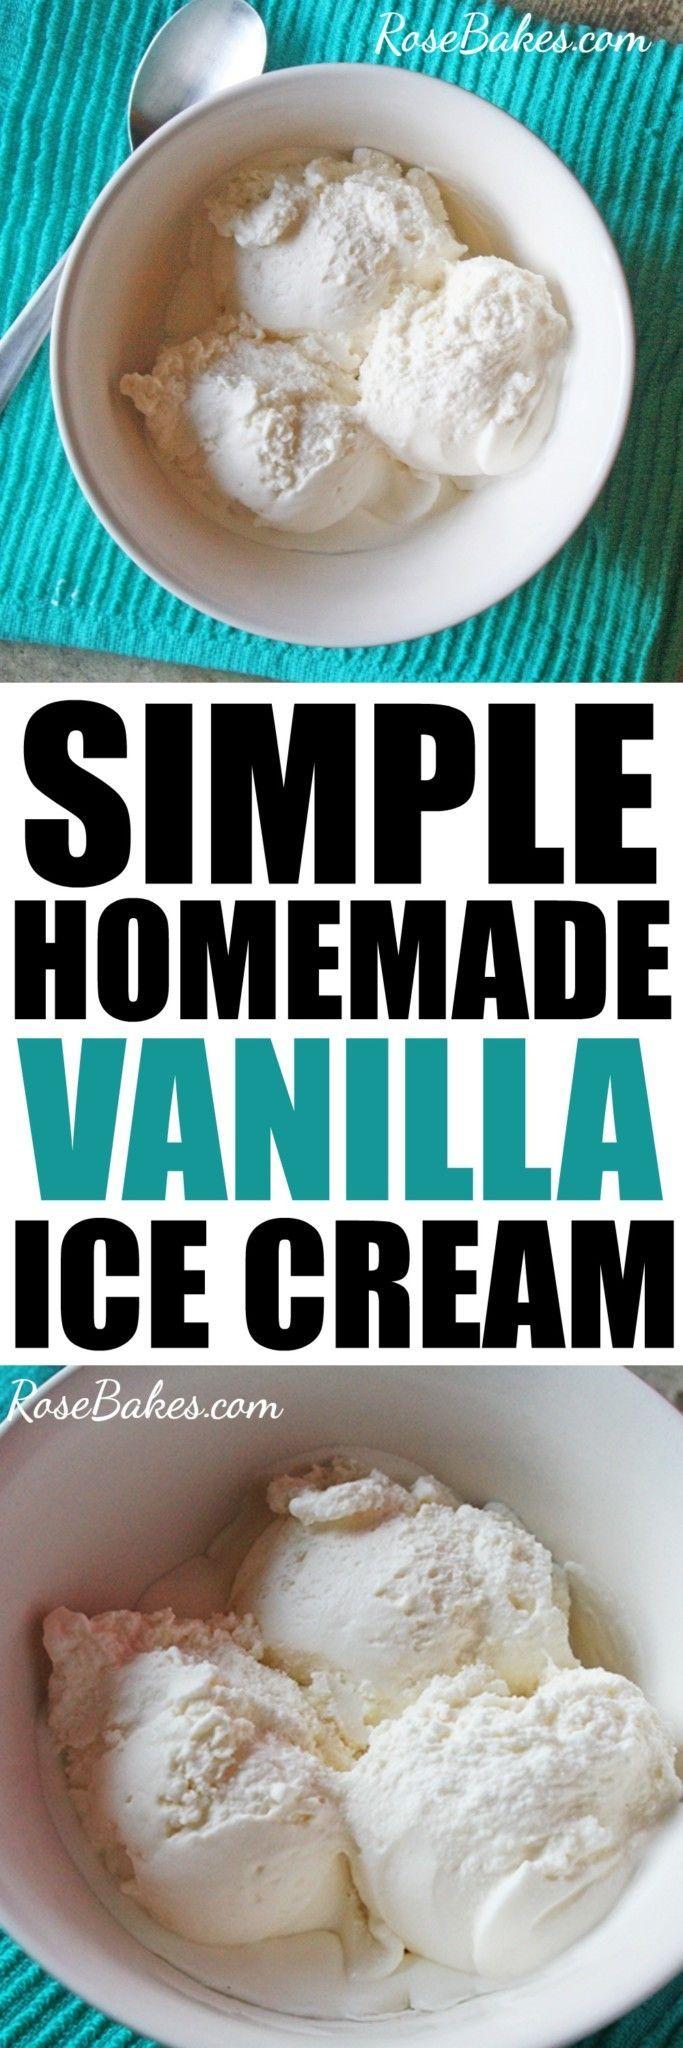 Simple Eggless Homemade Vanilla Ice Cream by RoseBakes